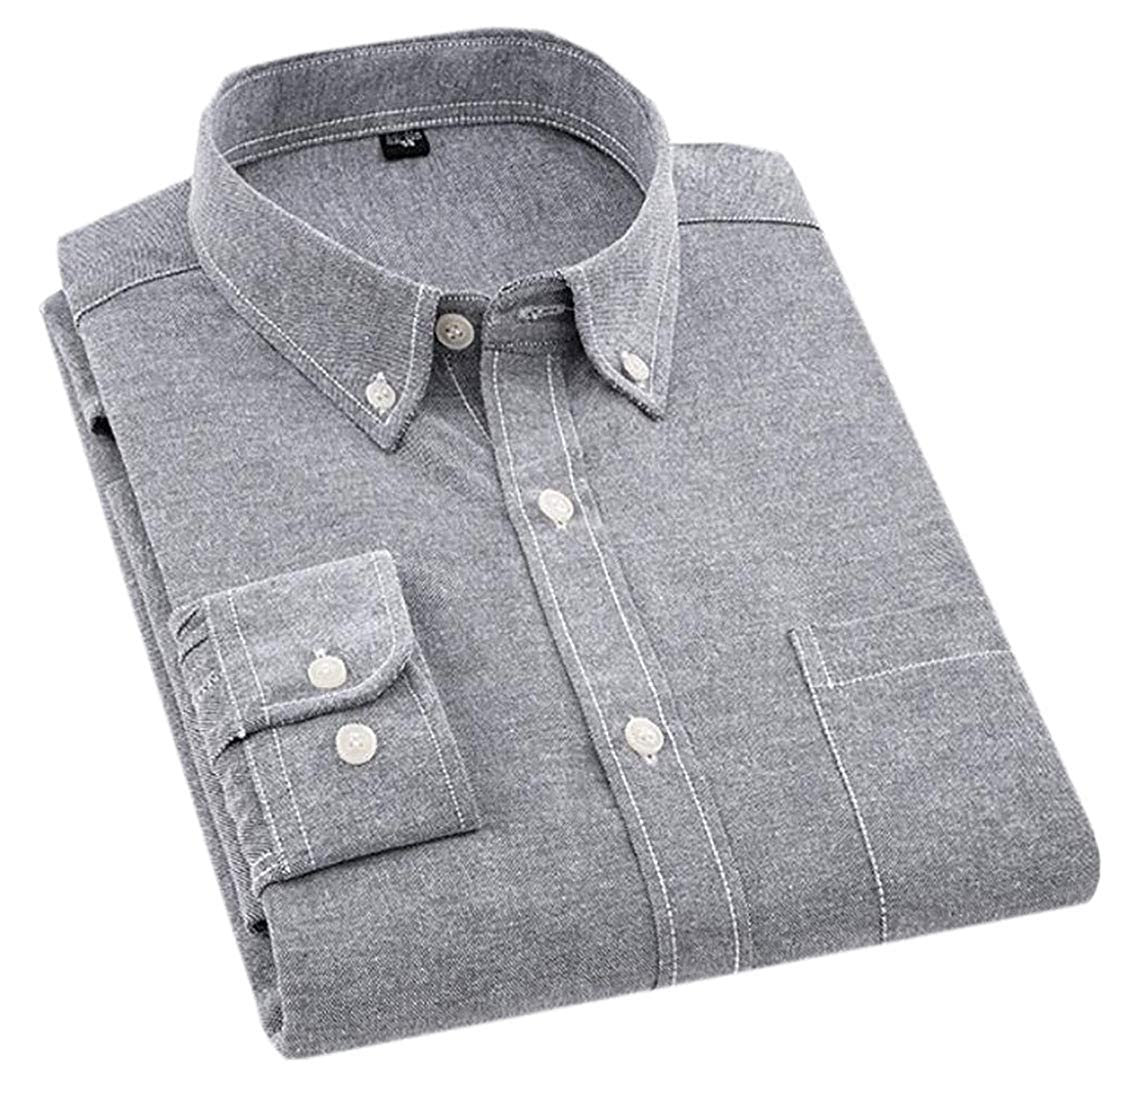 X-Future Mens Slim Fit Flap Pockets Formal Casual Oxford Plain Cotton Lapel Shirt